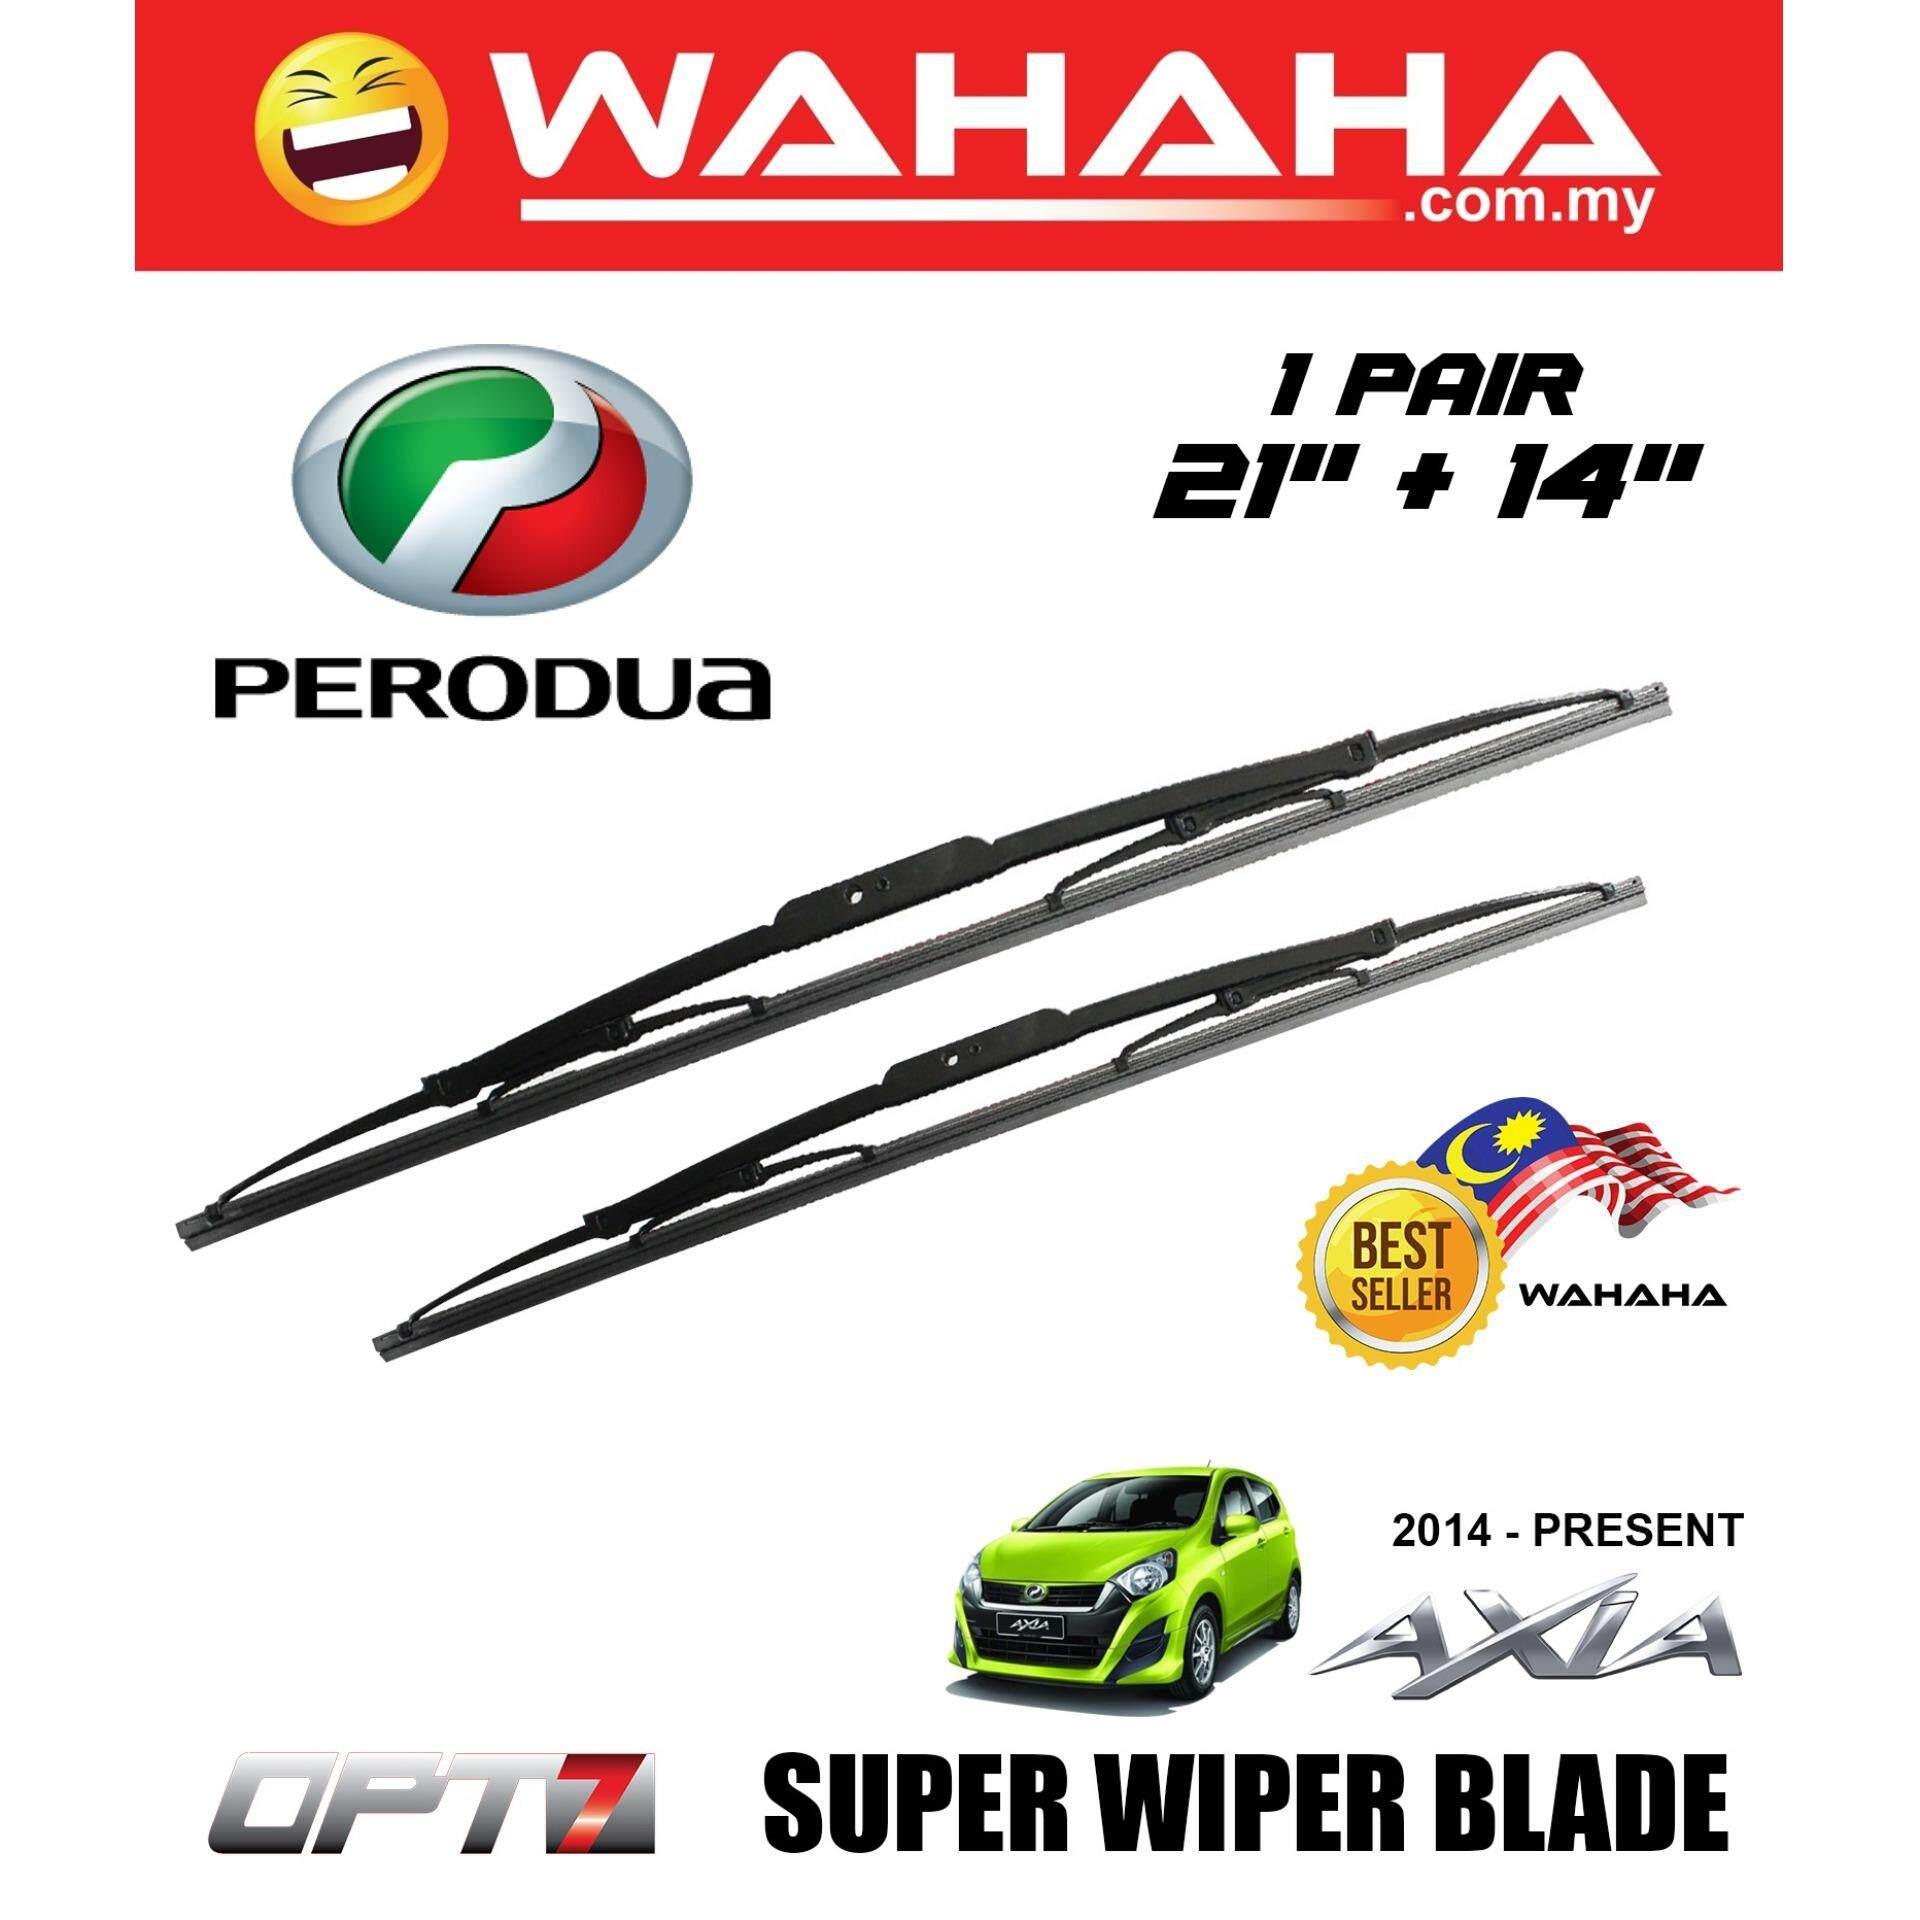 PERODUA AXIA OPT7 Car Window Windshield Super Wiper Blade 21 +14